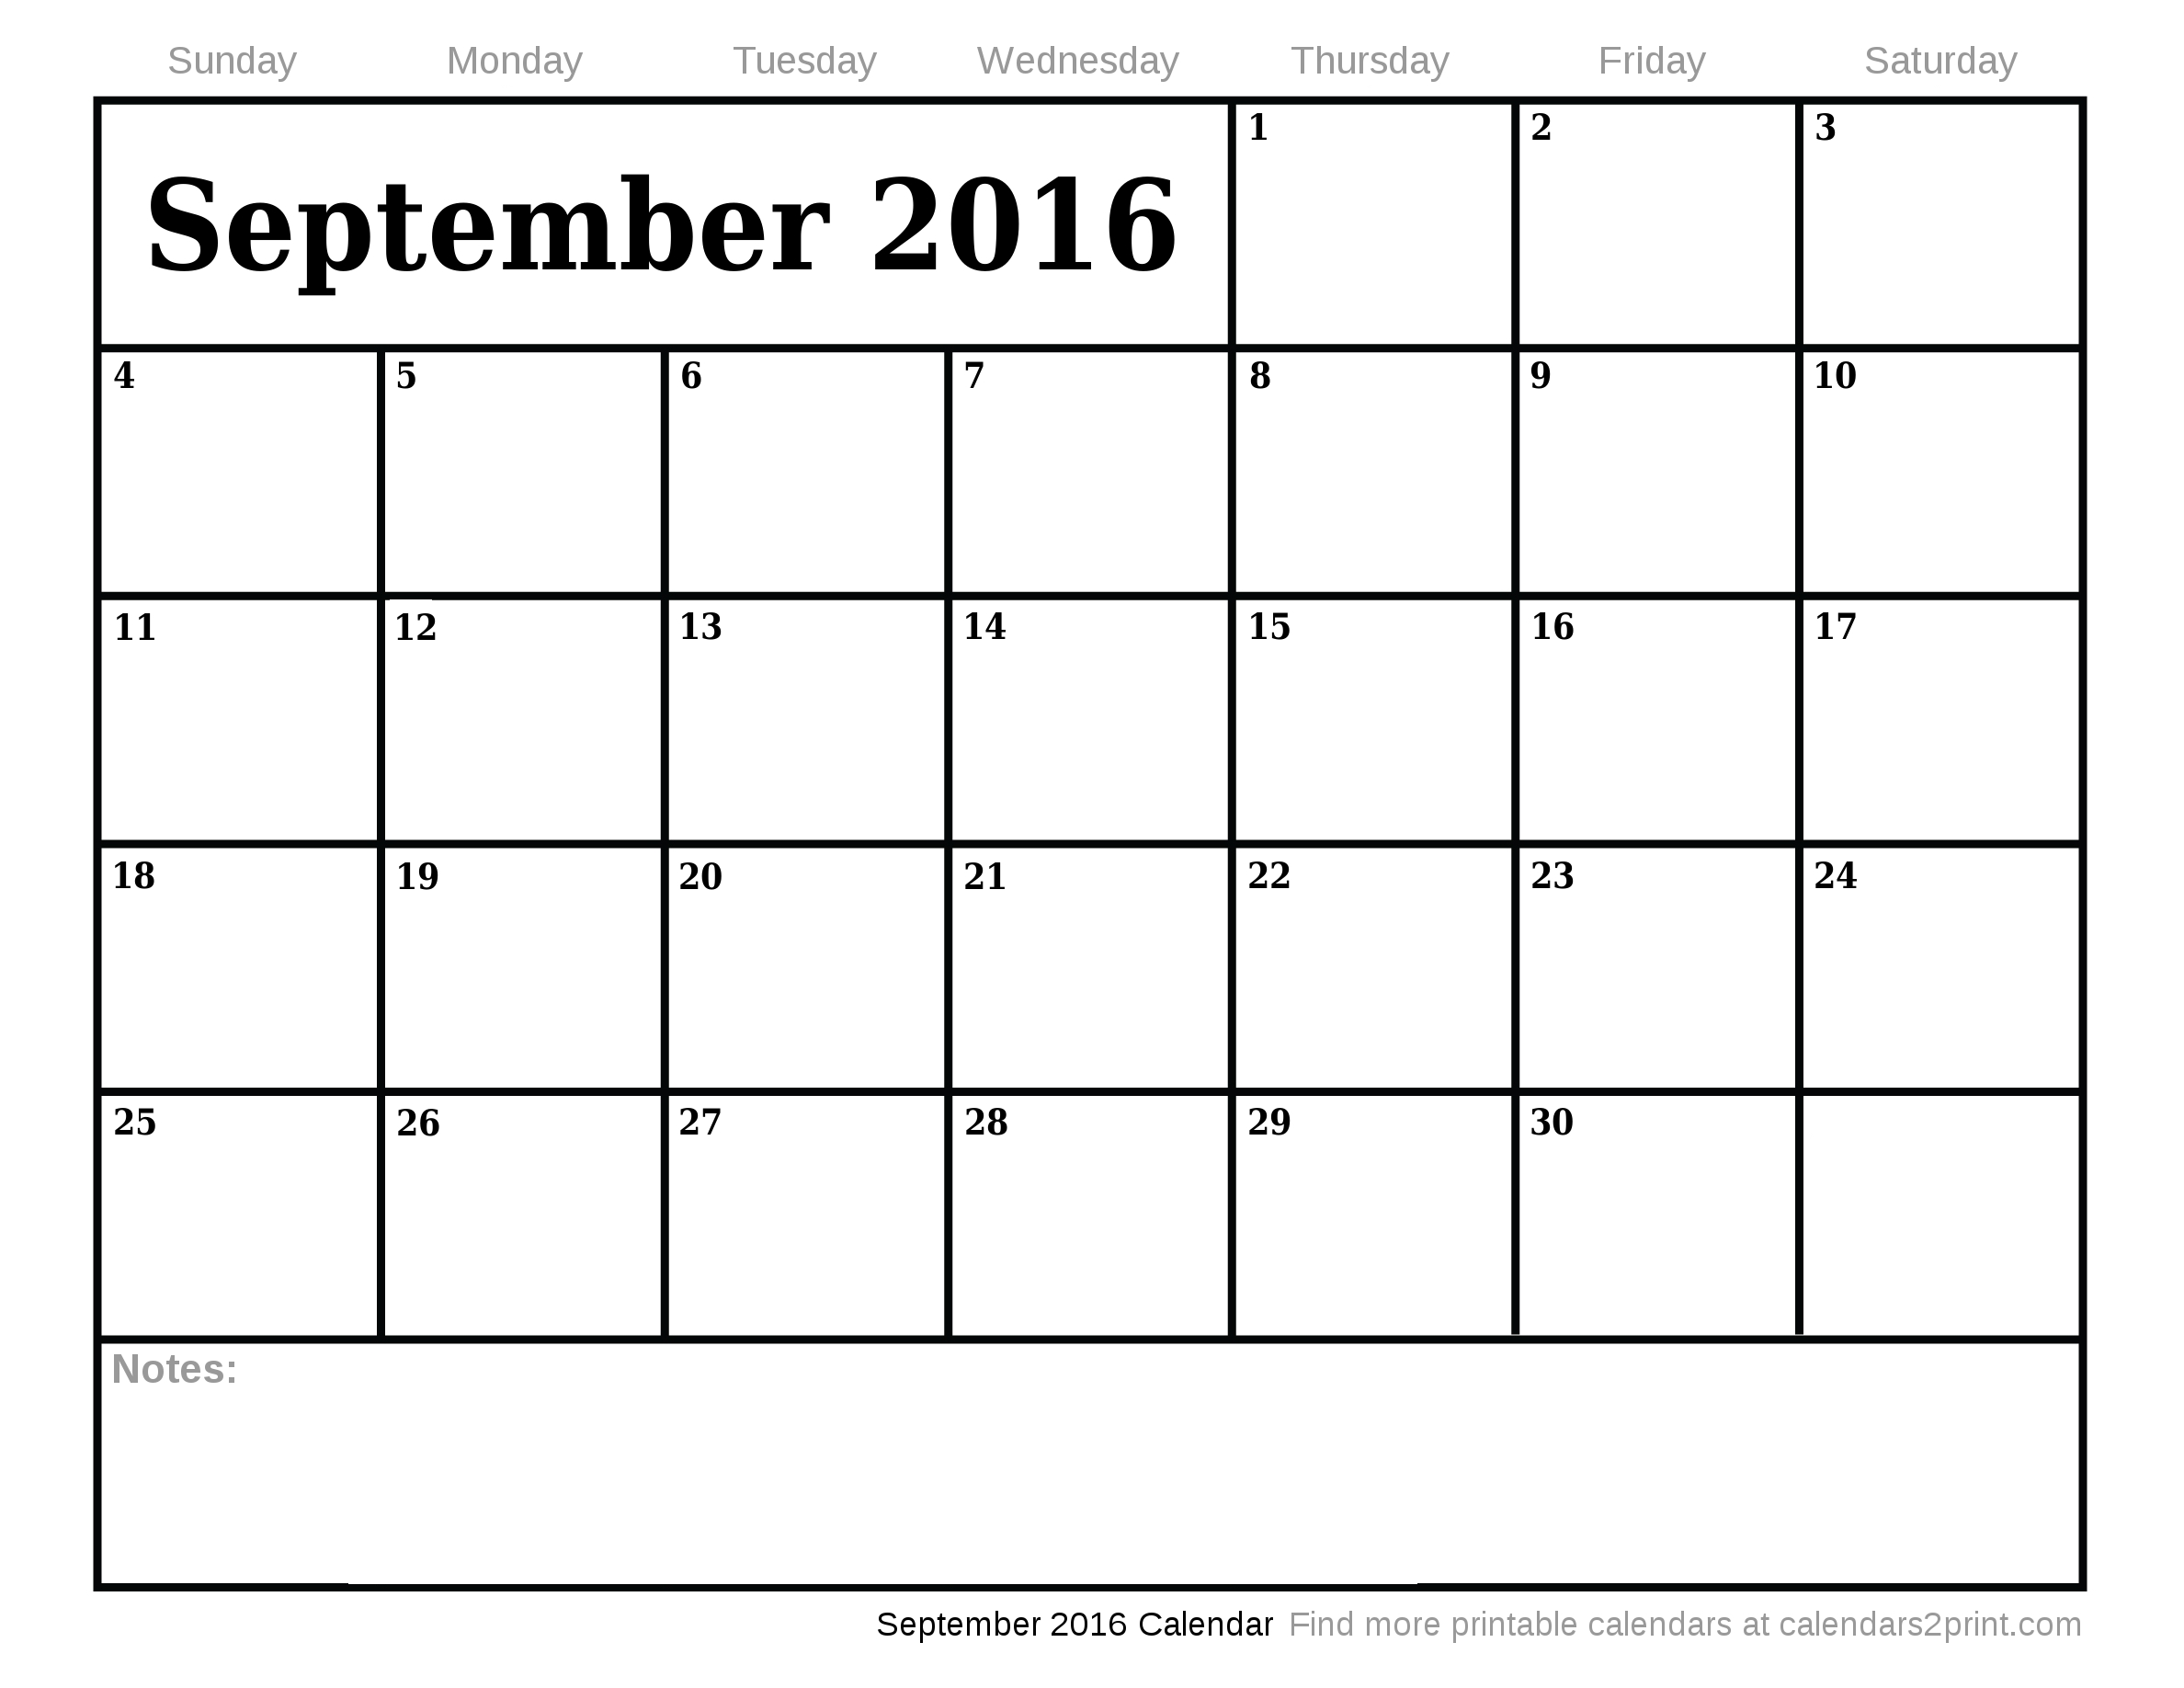 September 2016 Printable Calendar, October 2016 Calendar